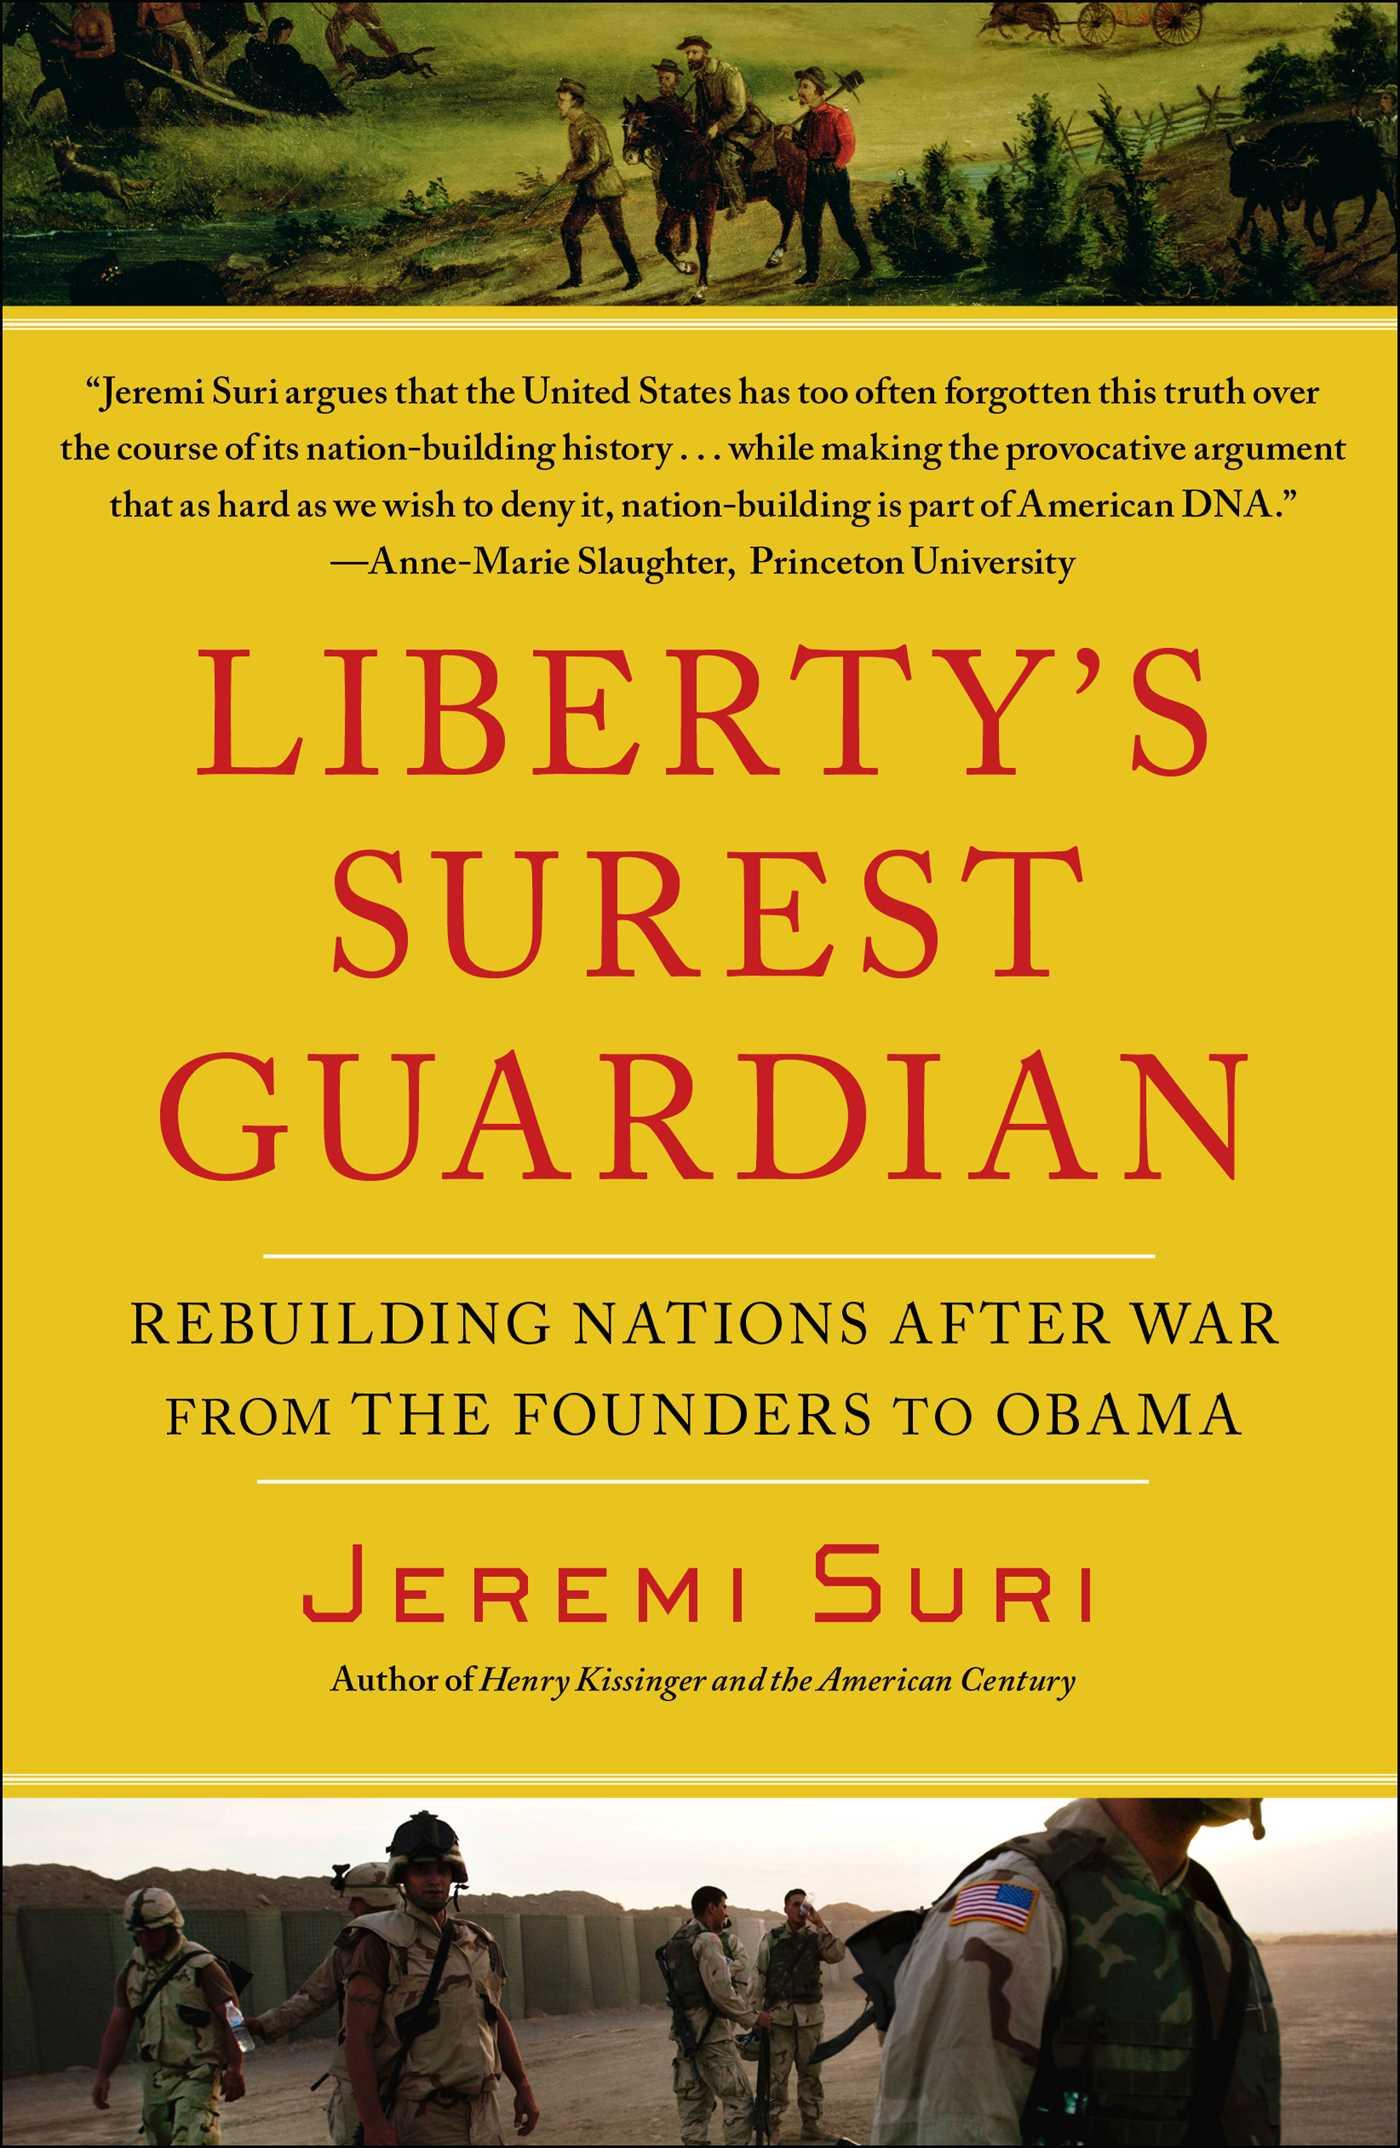 Libertys surest guardian 9781439141700 hr